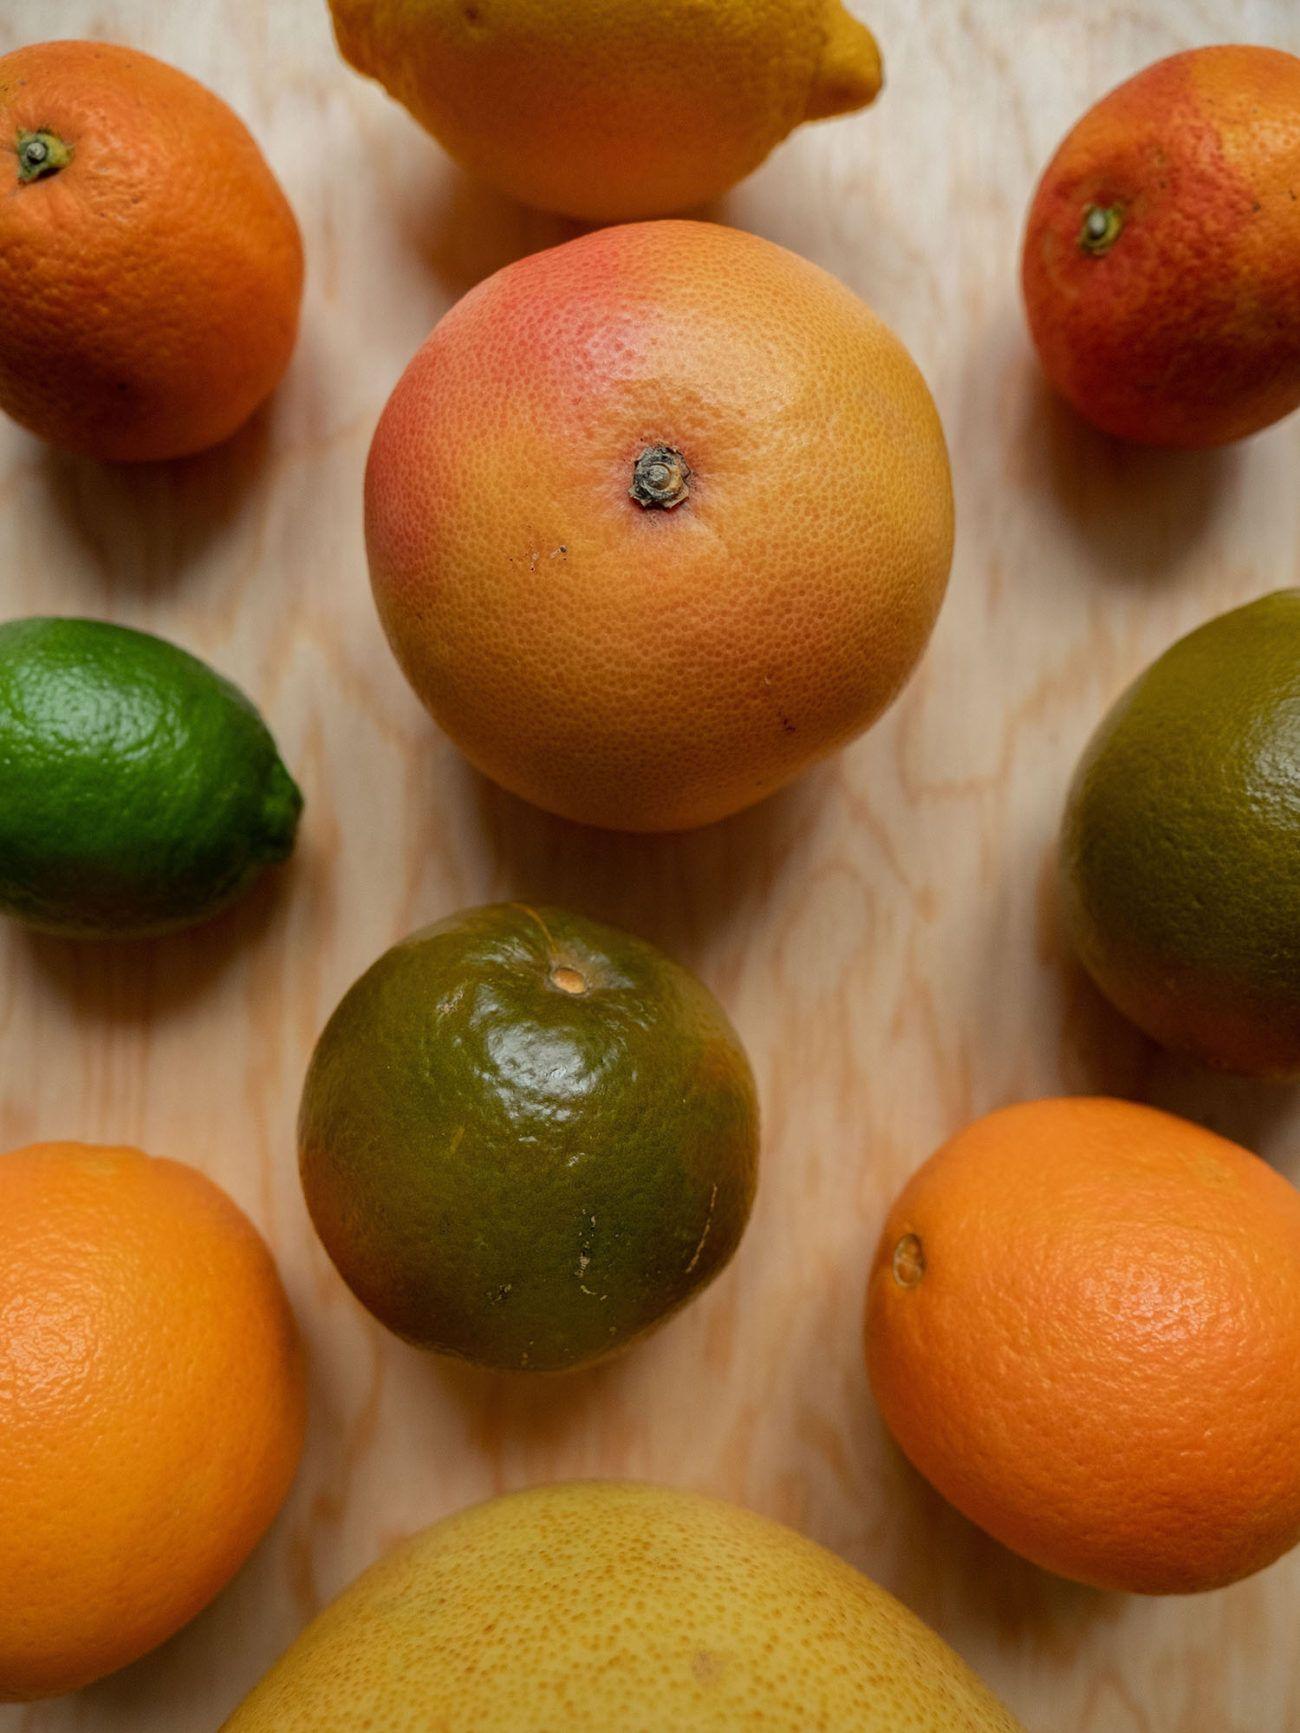 Rezept_Zitrussalat mit Avocado und Pistaziendressing, Grapefruit, Orange, Limette, Pomelo